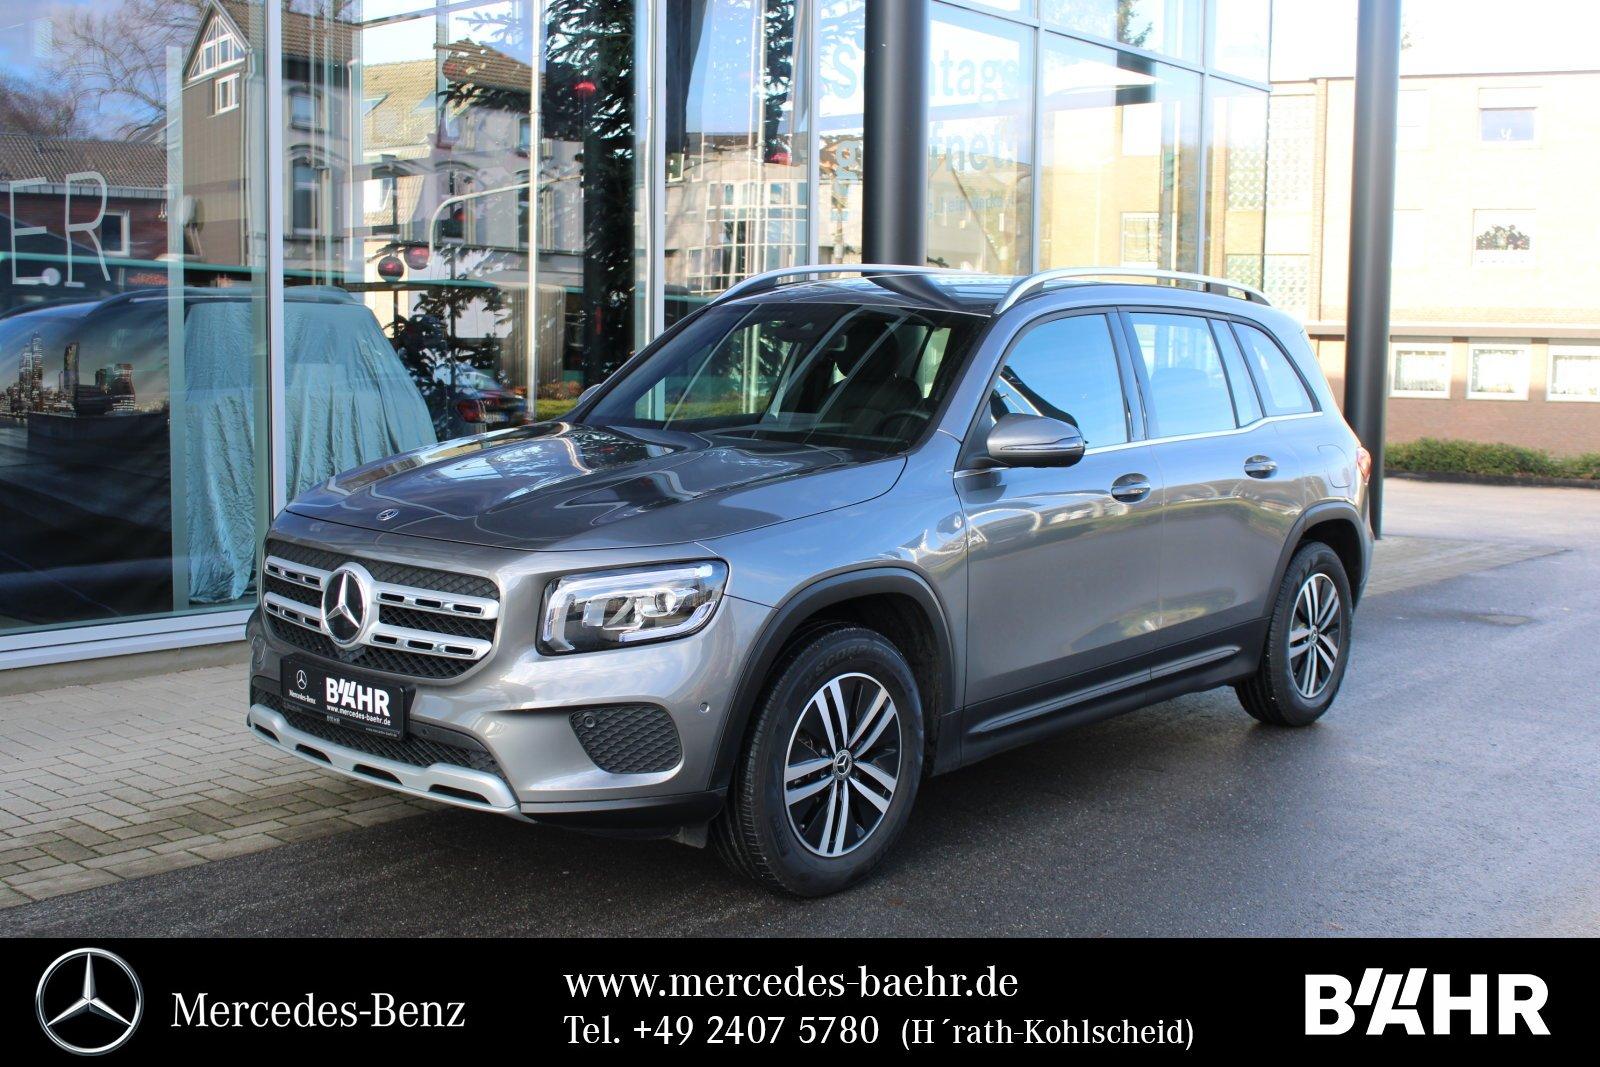 Mercedes-Benz GLB 180 d Style/Navi/Autom./Klima/LED/Sitzhzg., Jahr 2019, Diesel